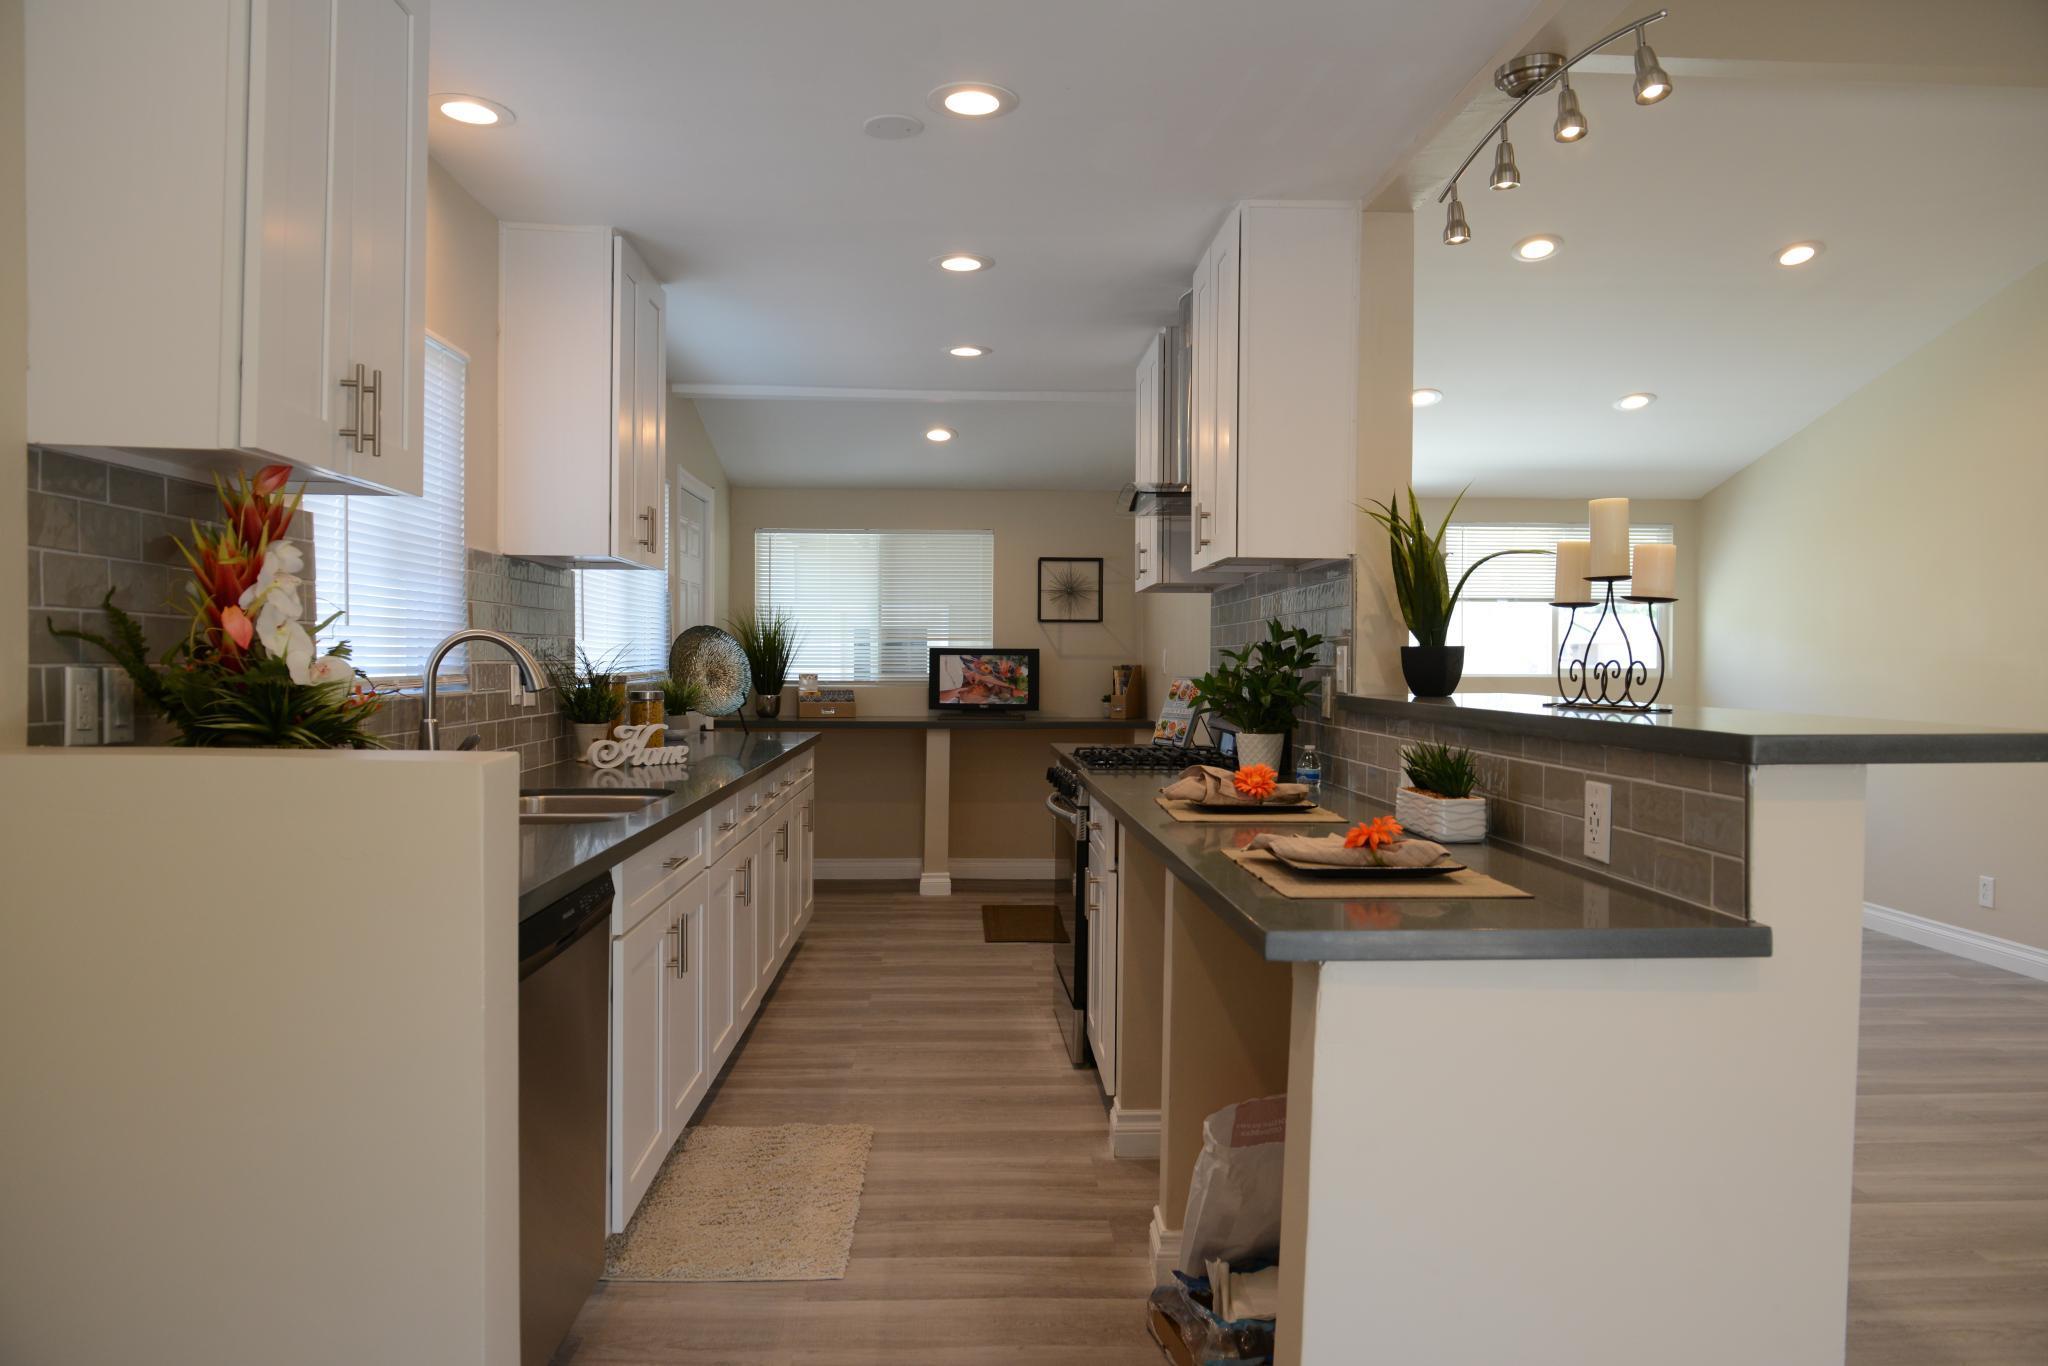 11732 Brookshire Ave, Garden Grove, CA 92840 For Rent | Trulia